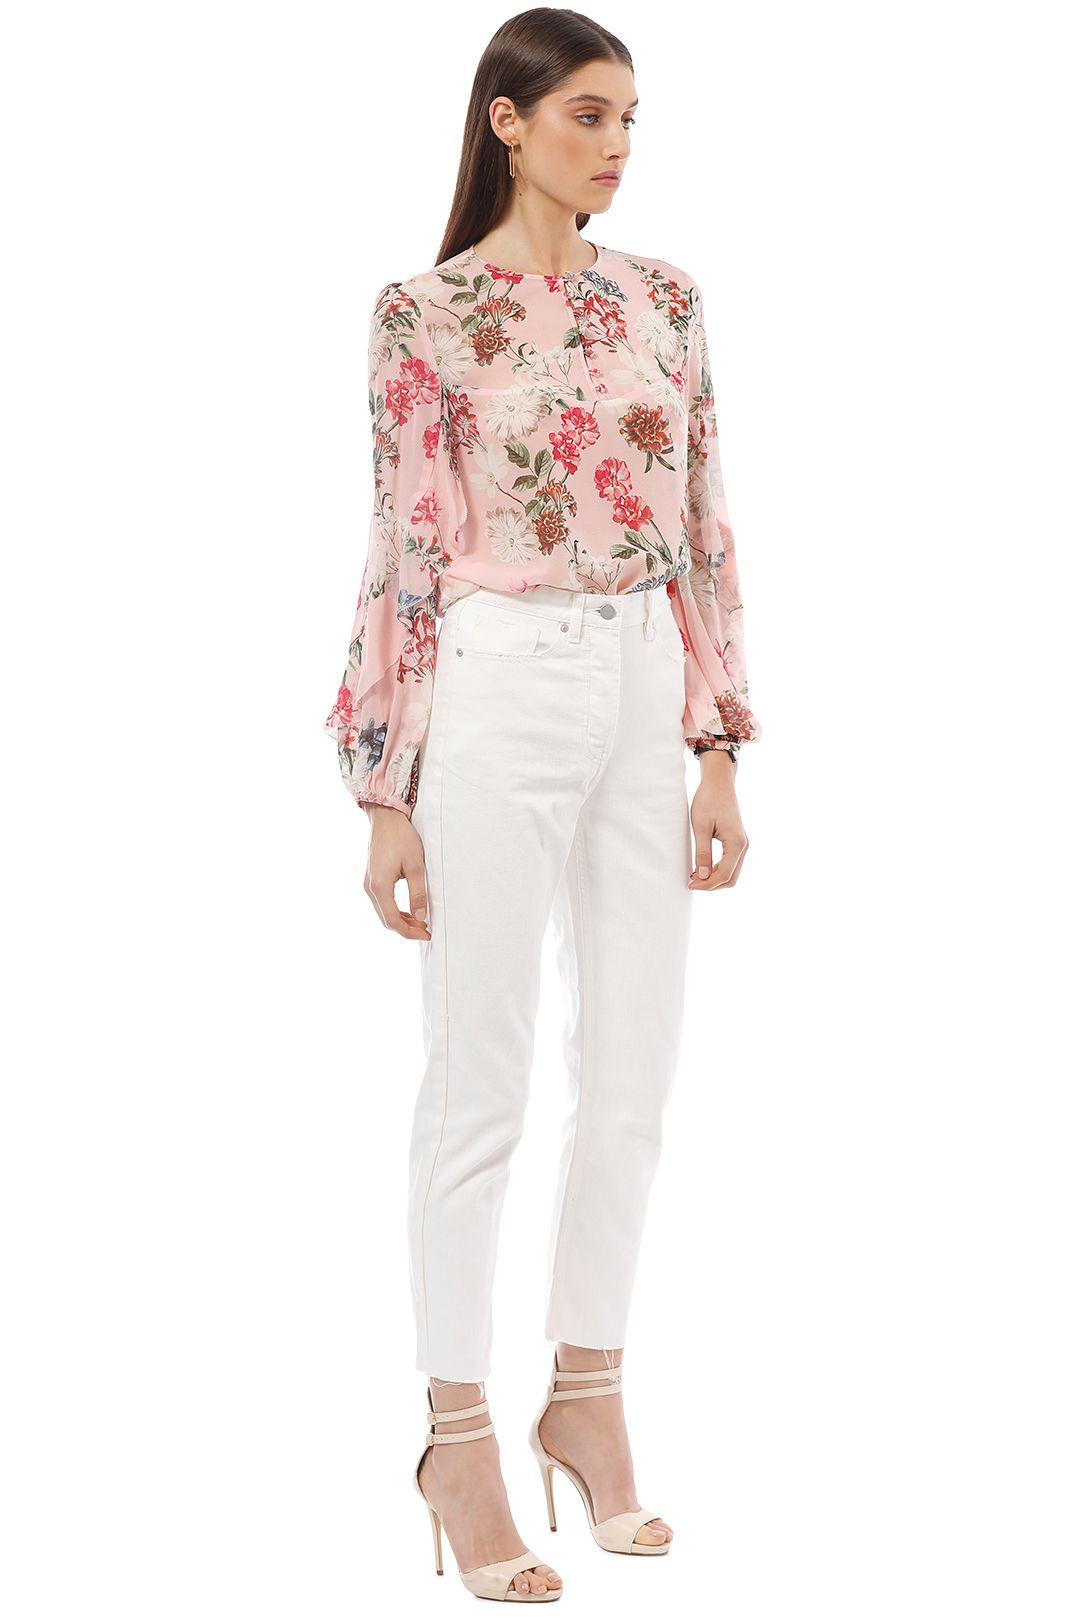 Nicholas the Label - Lilac Floral Yoke Blouse - Pink - Side